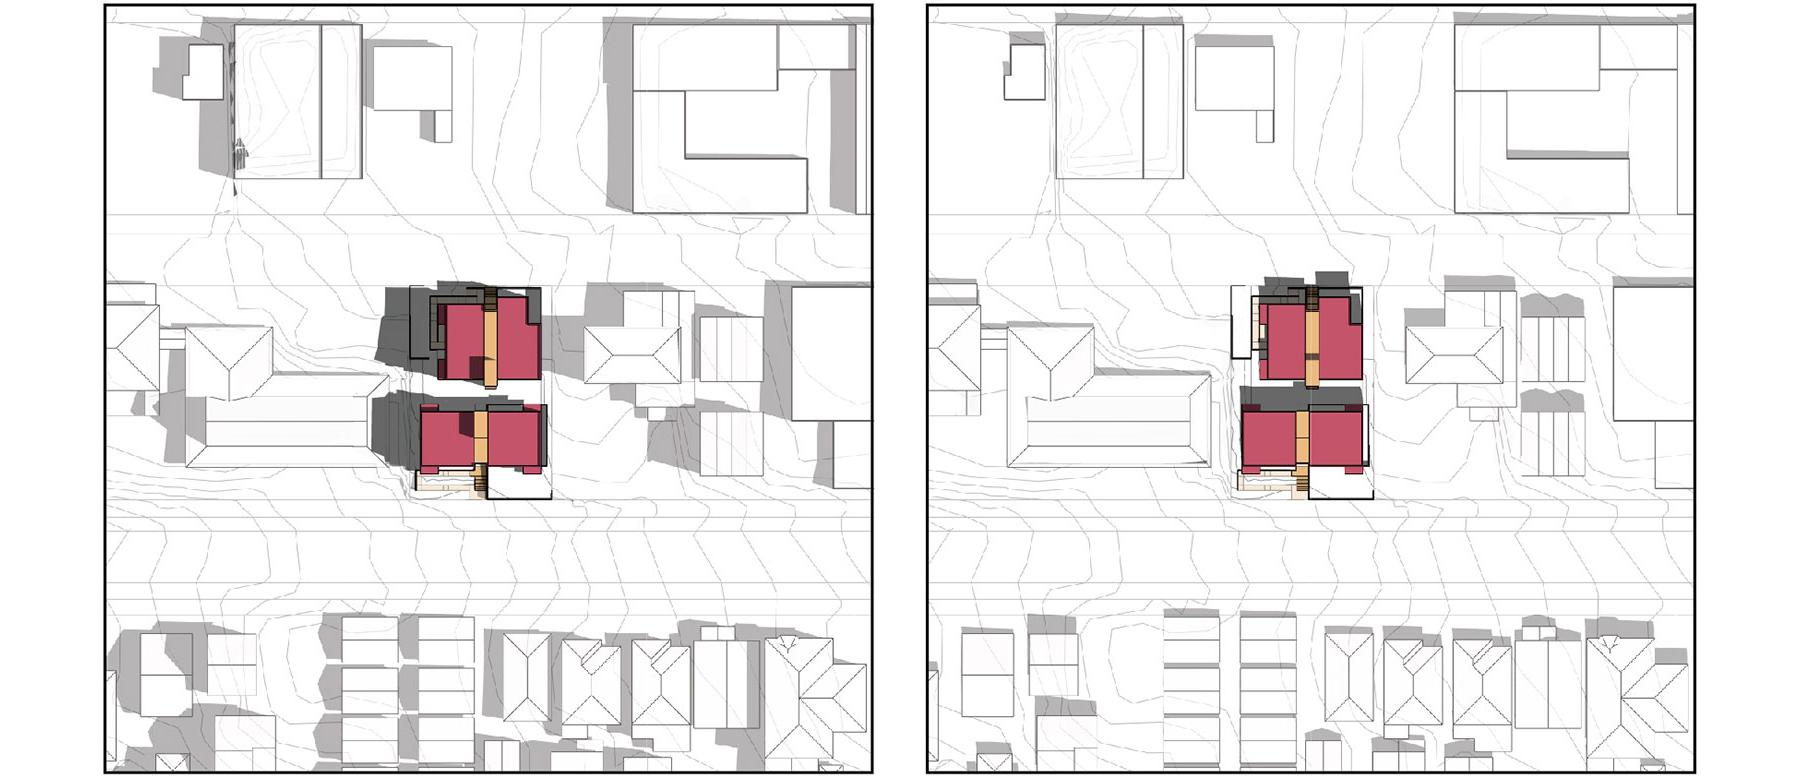 King-St_EDG_Shadow-Studies---Scheme-3.jpg